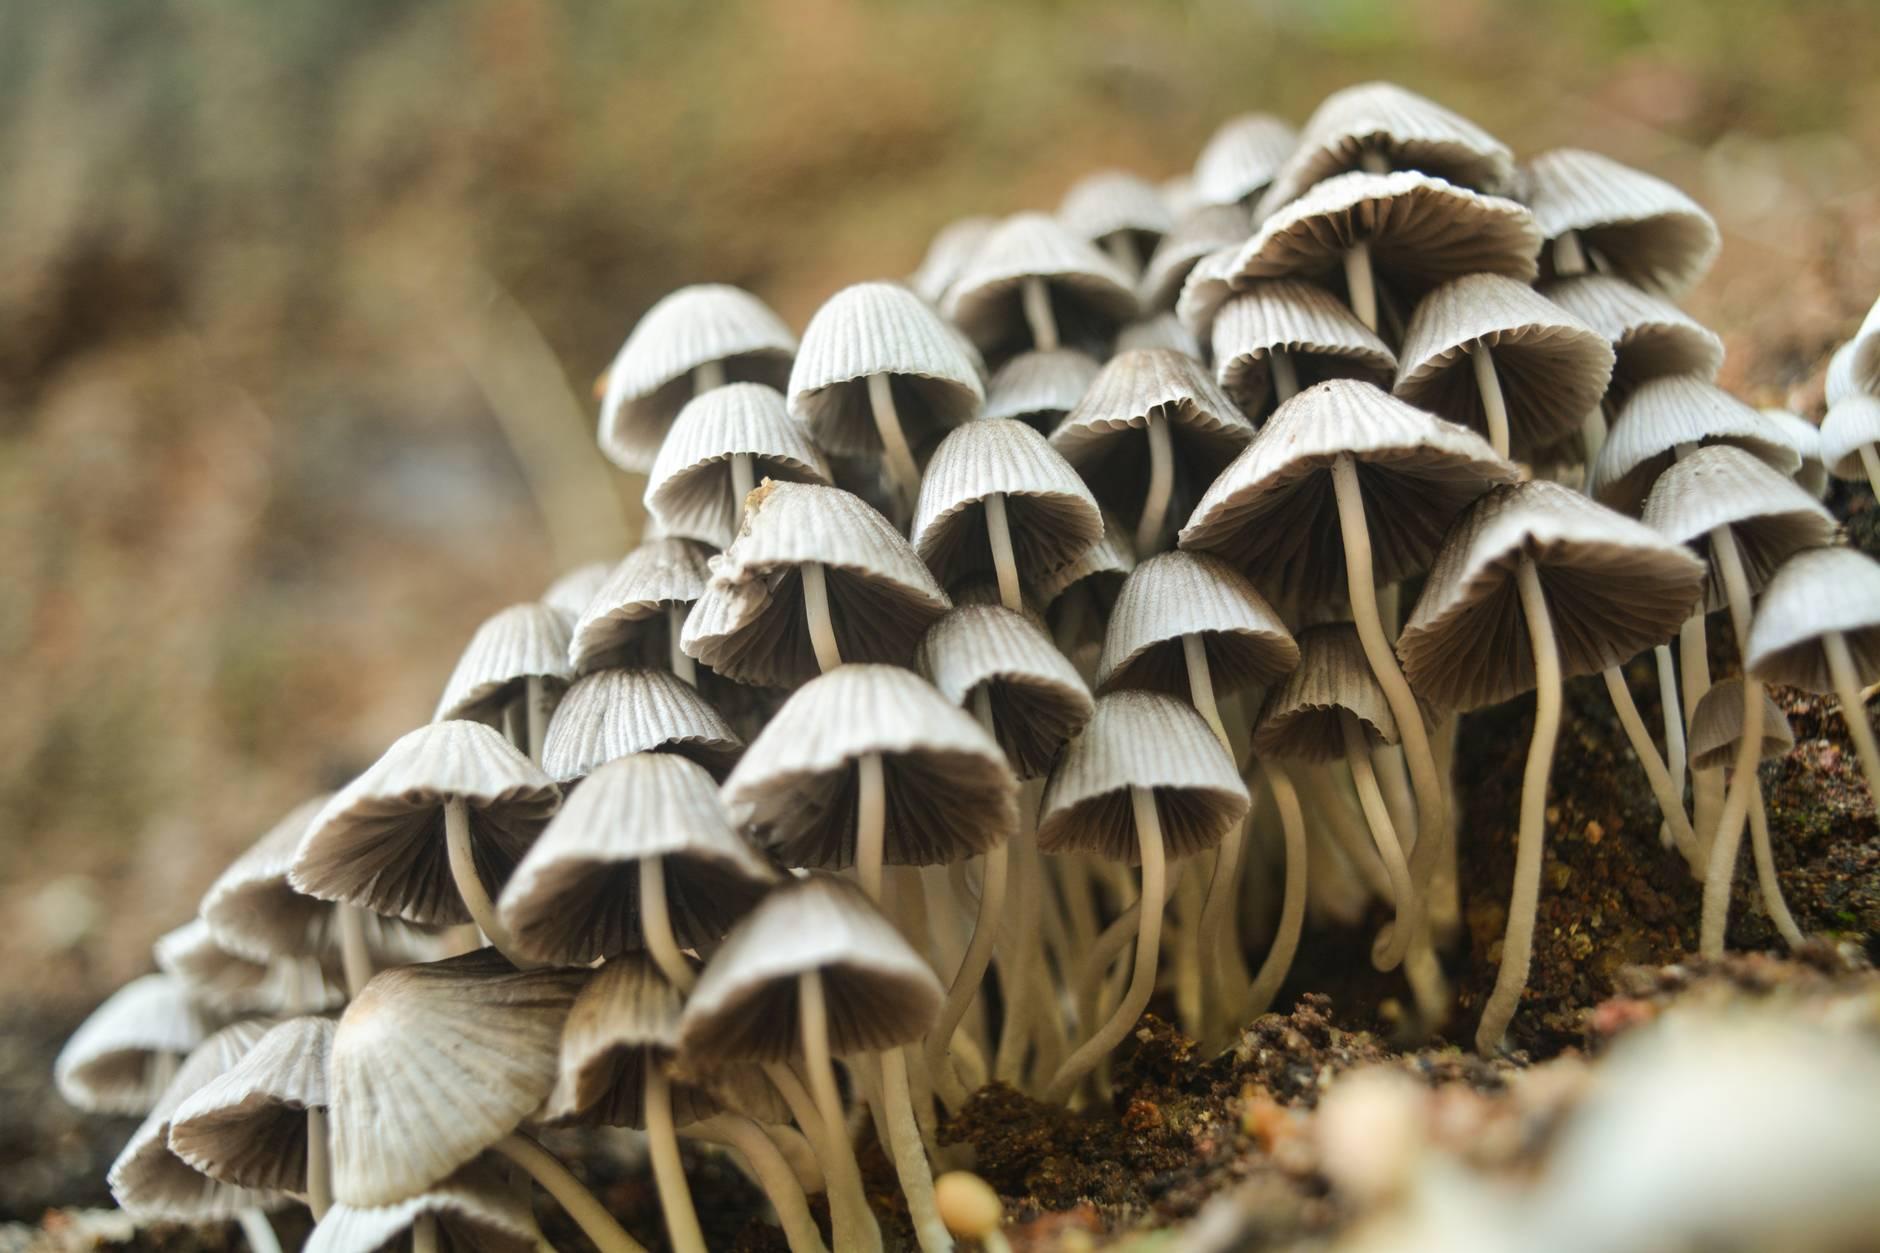 closeup photo of white mushrooms